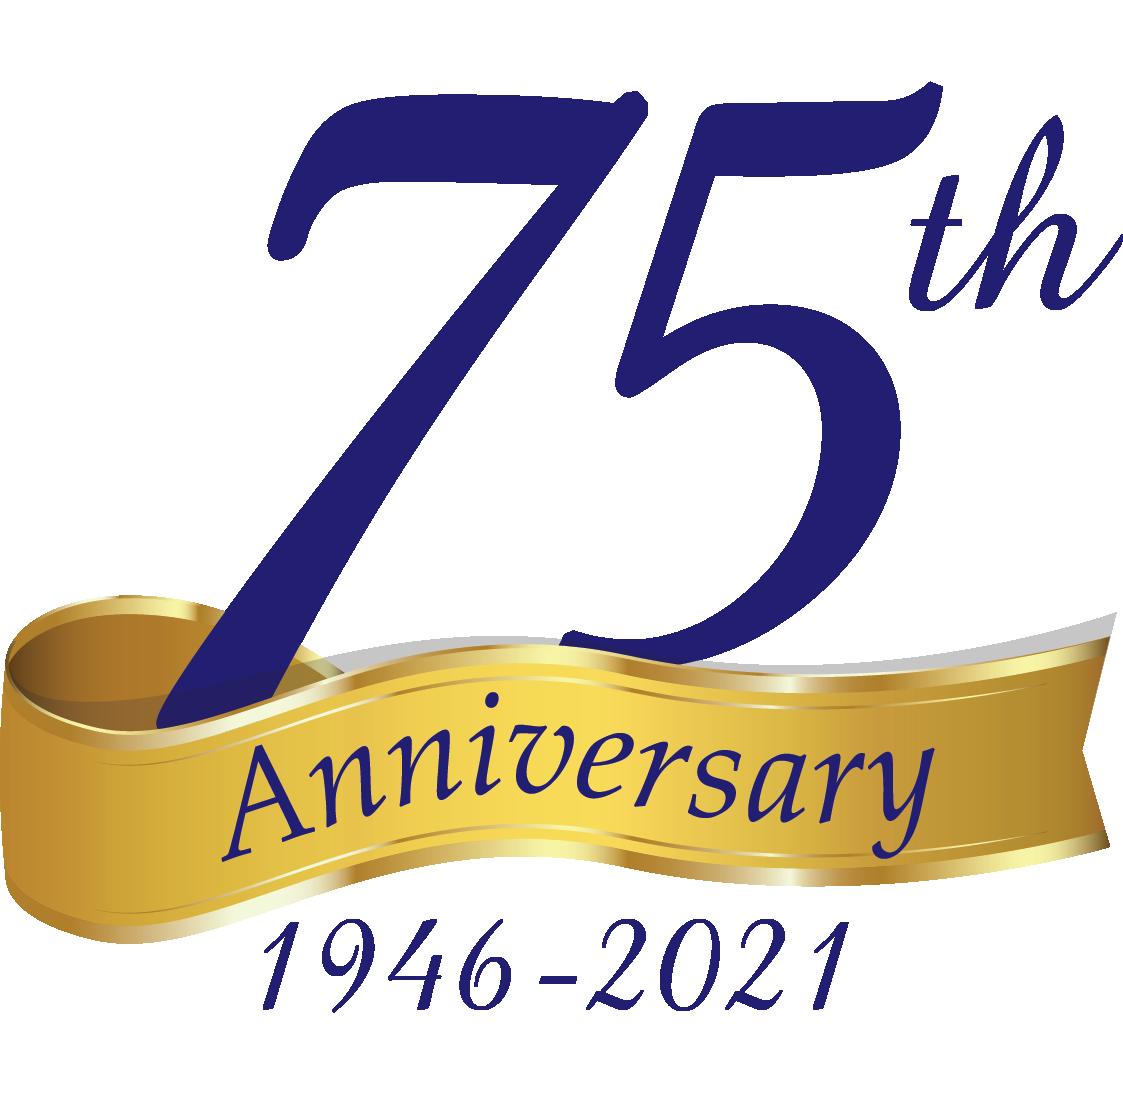 75th Anniversary Celebration Registration Form